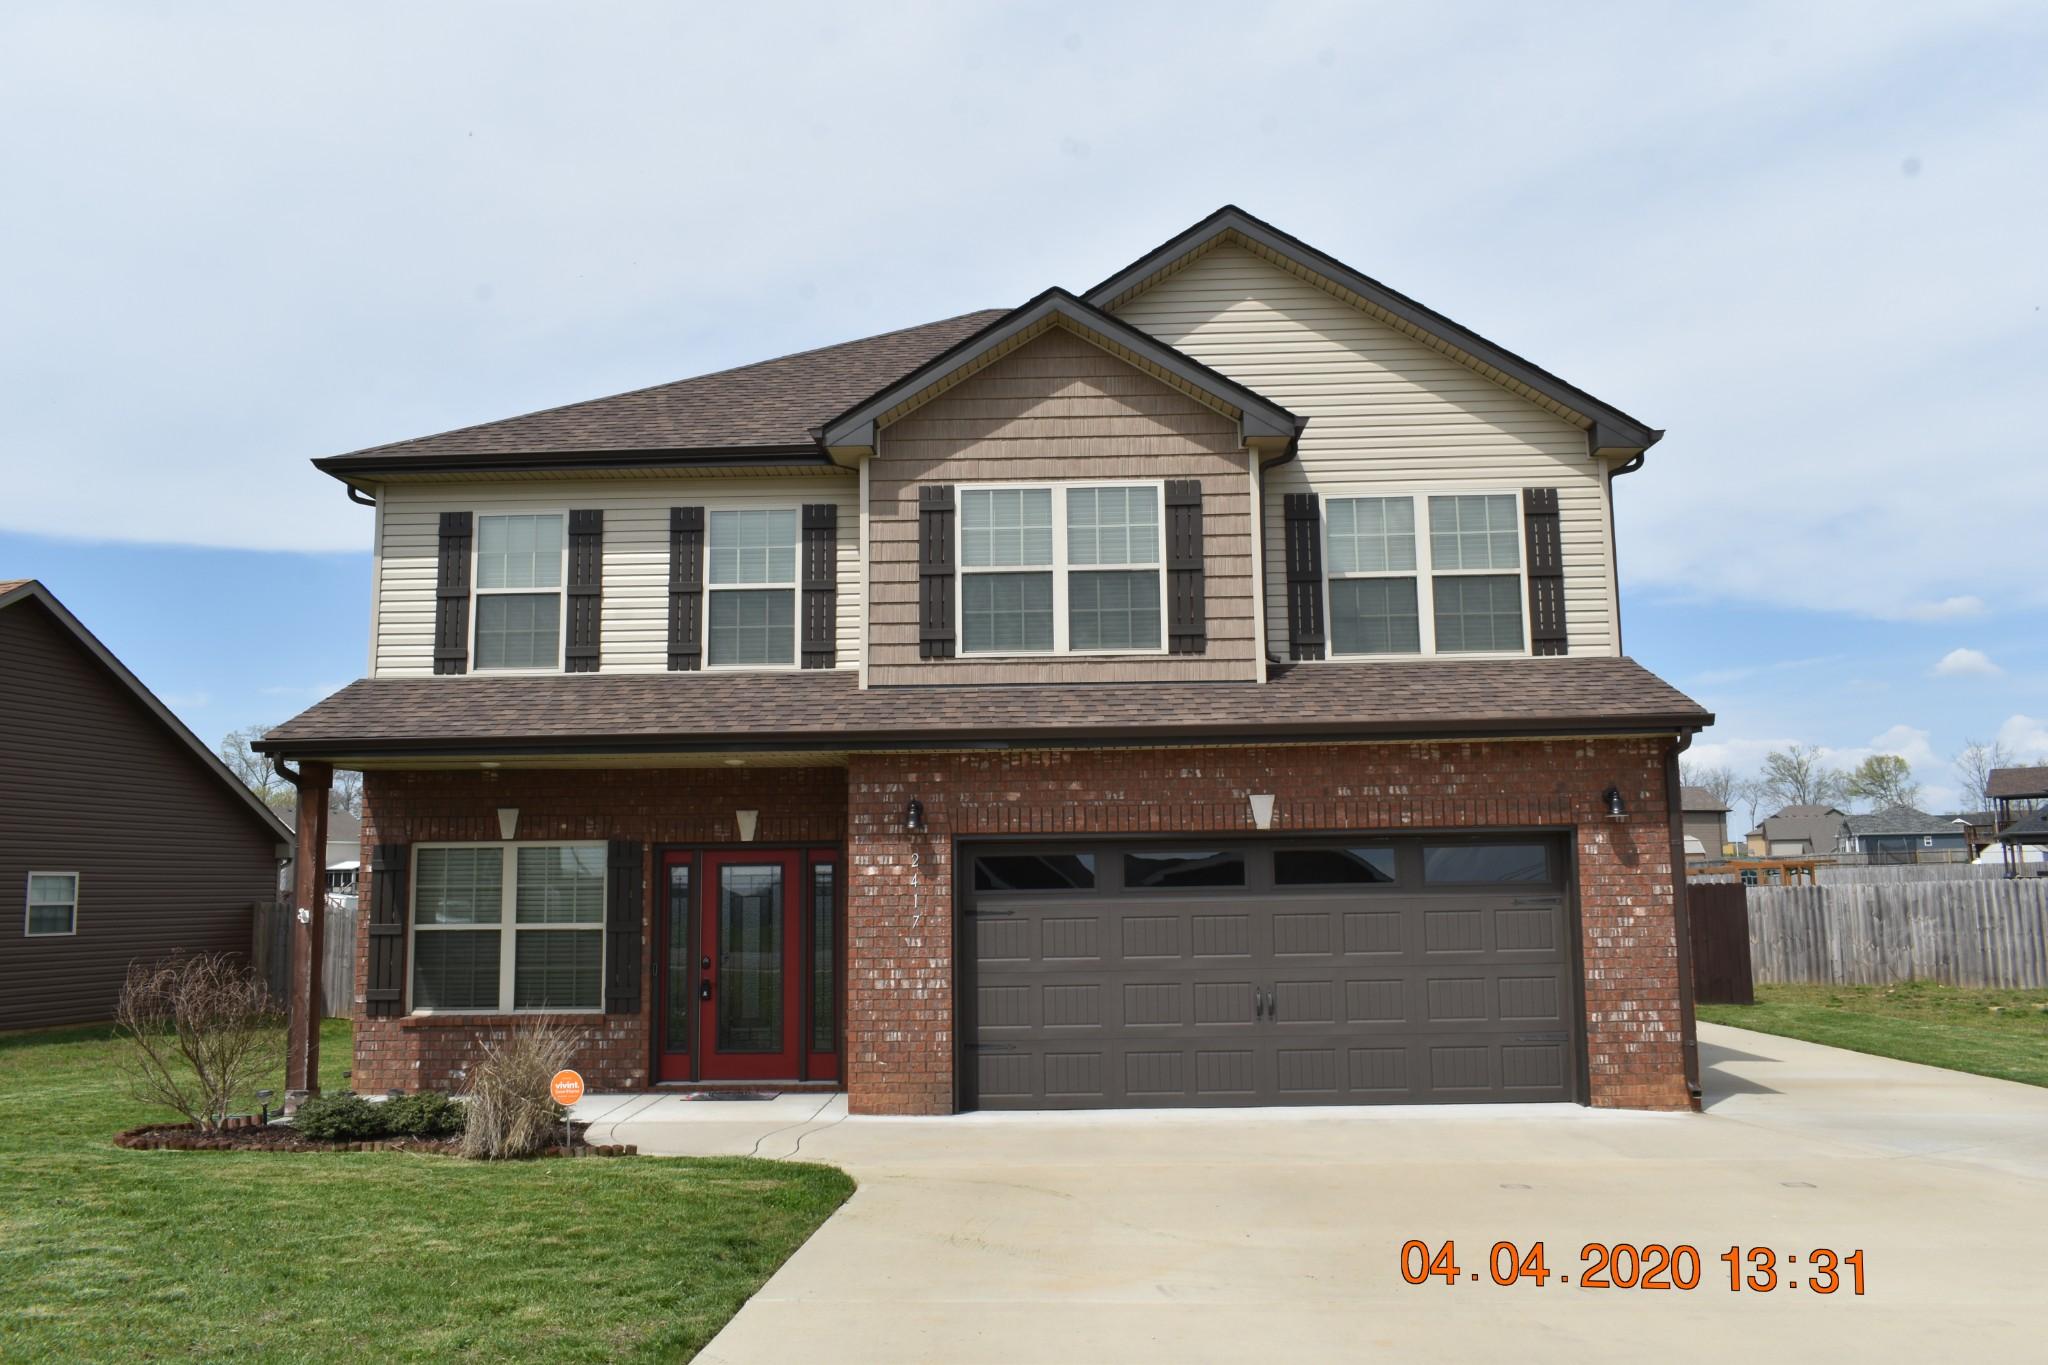 2417 Andersonville Dr, Clarksville, TN 37042 - Clarksville, TN real estate listing